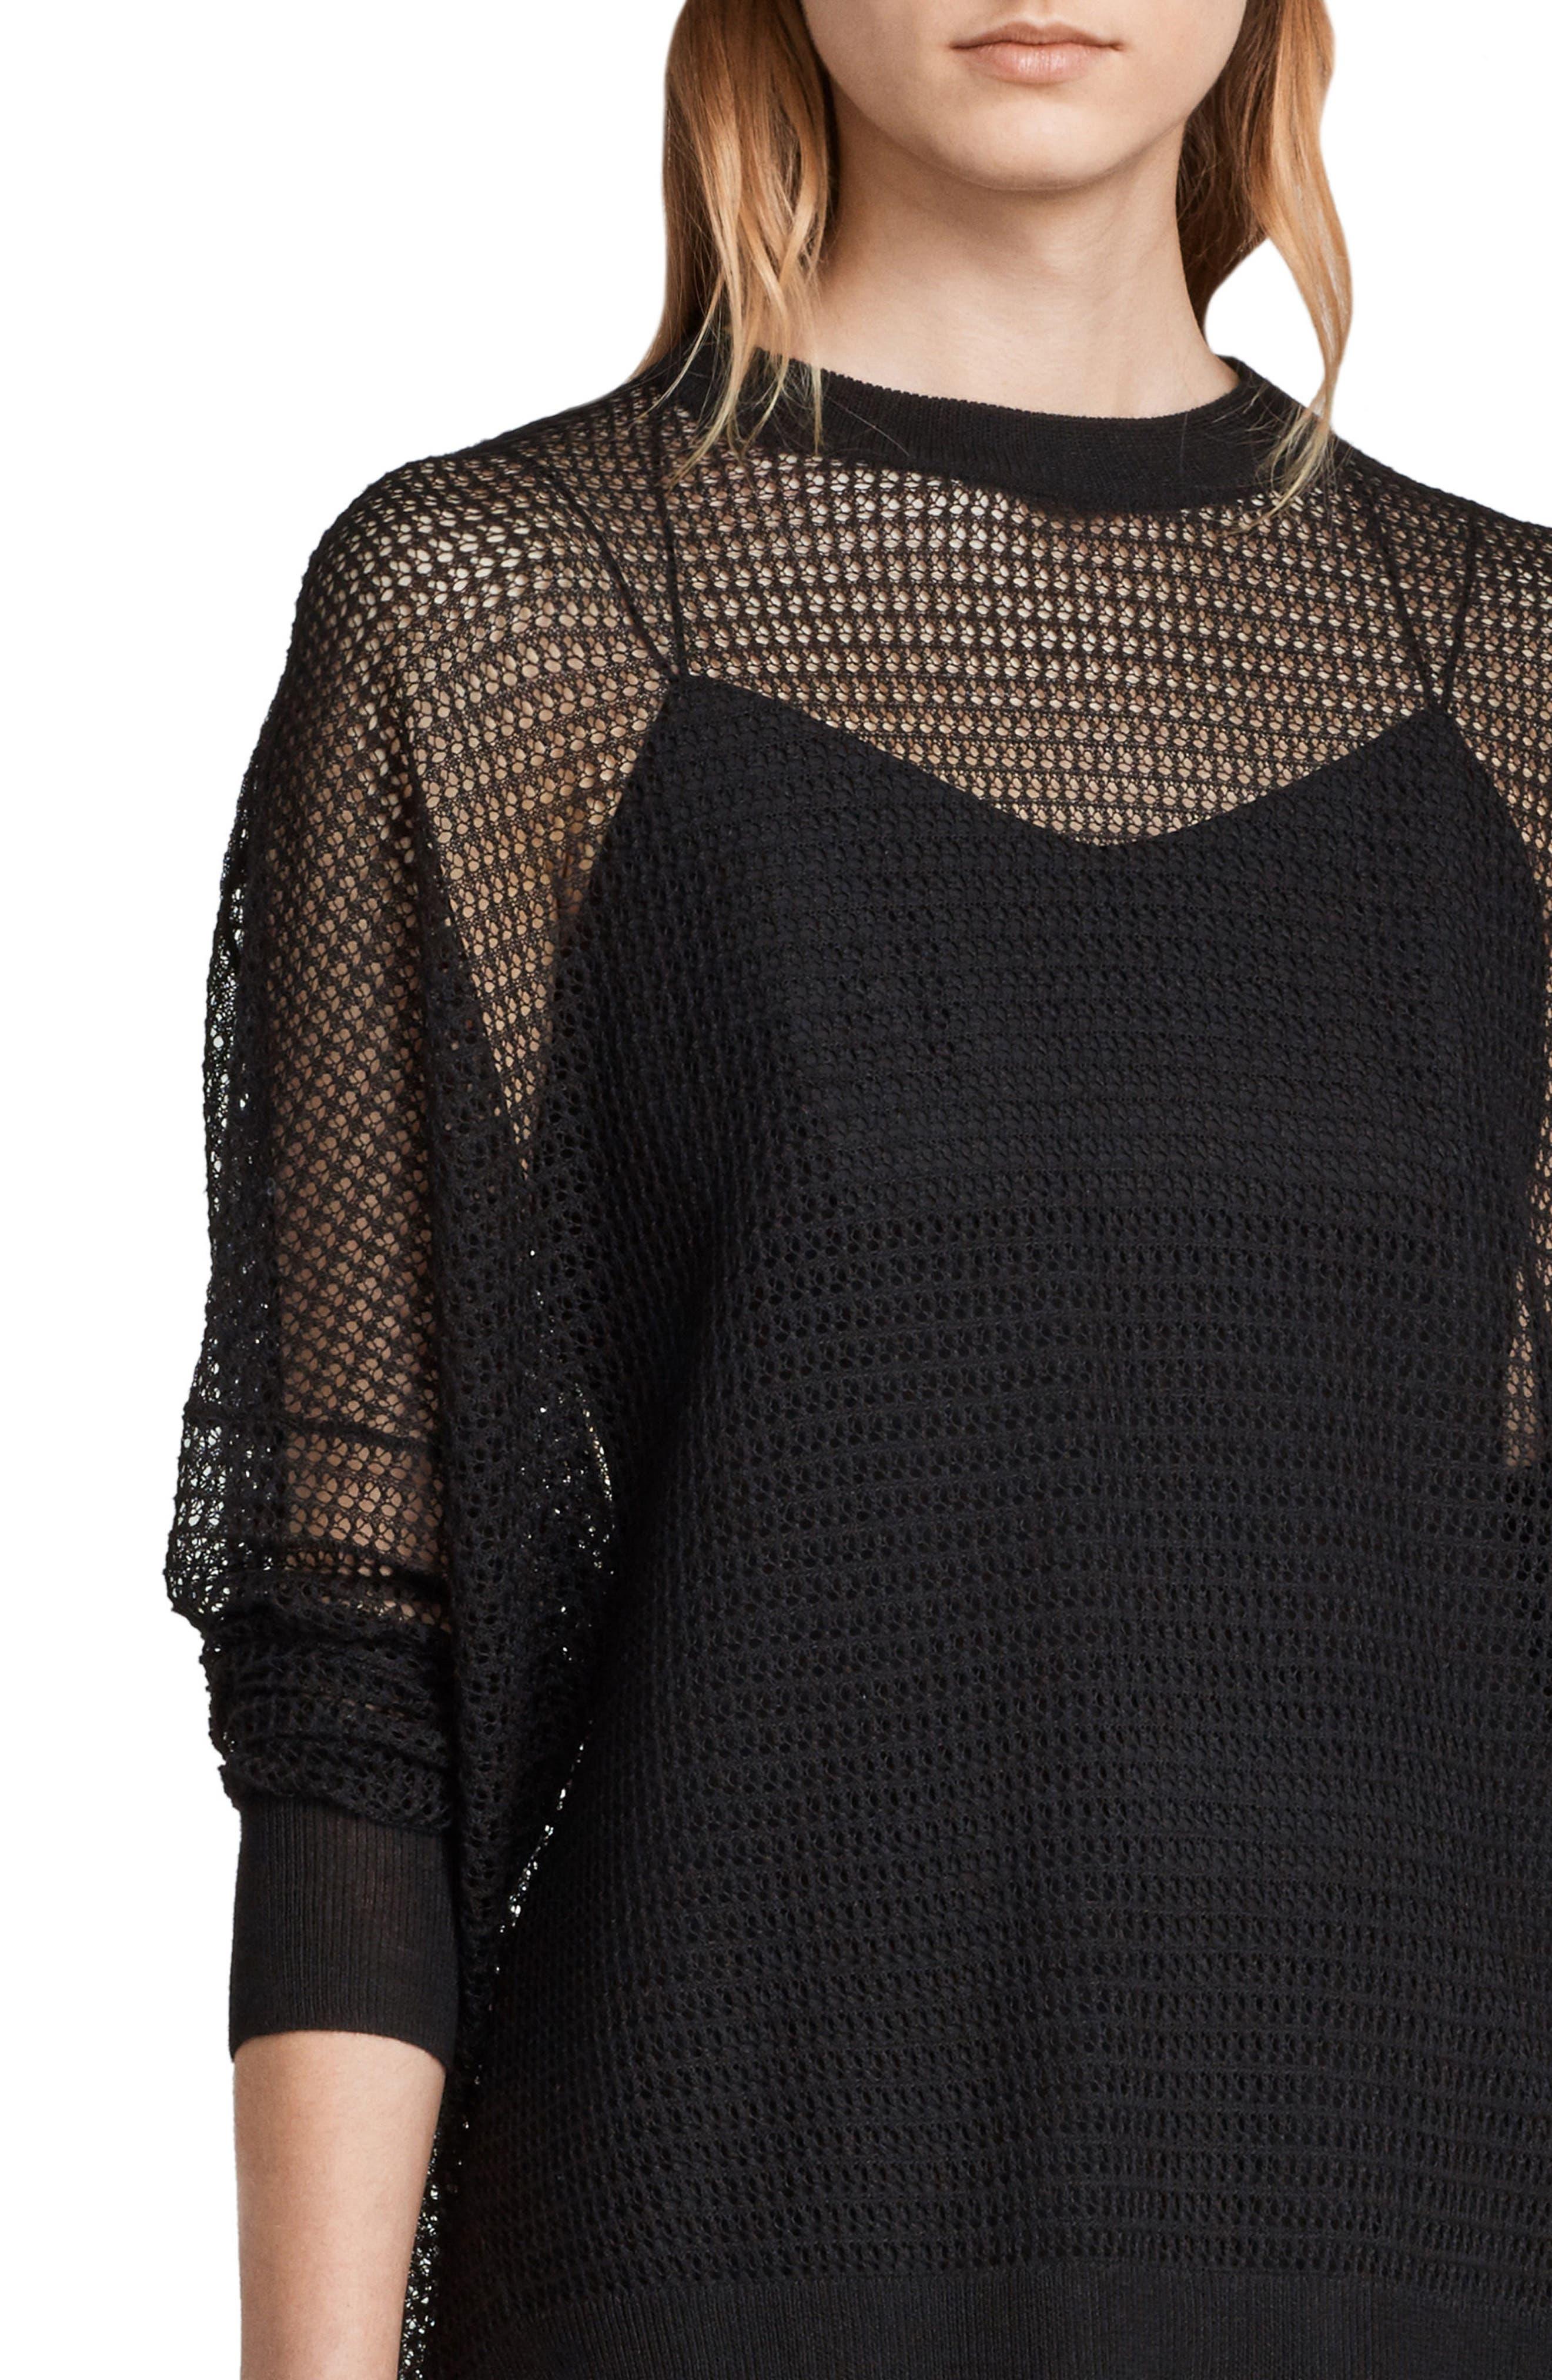 Rizo Openwork Sweater,                             Alternate thumbnail 4, color,                             Black